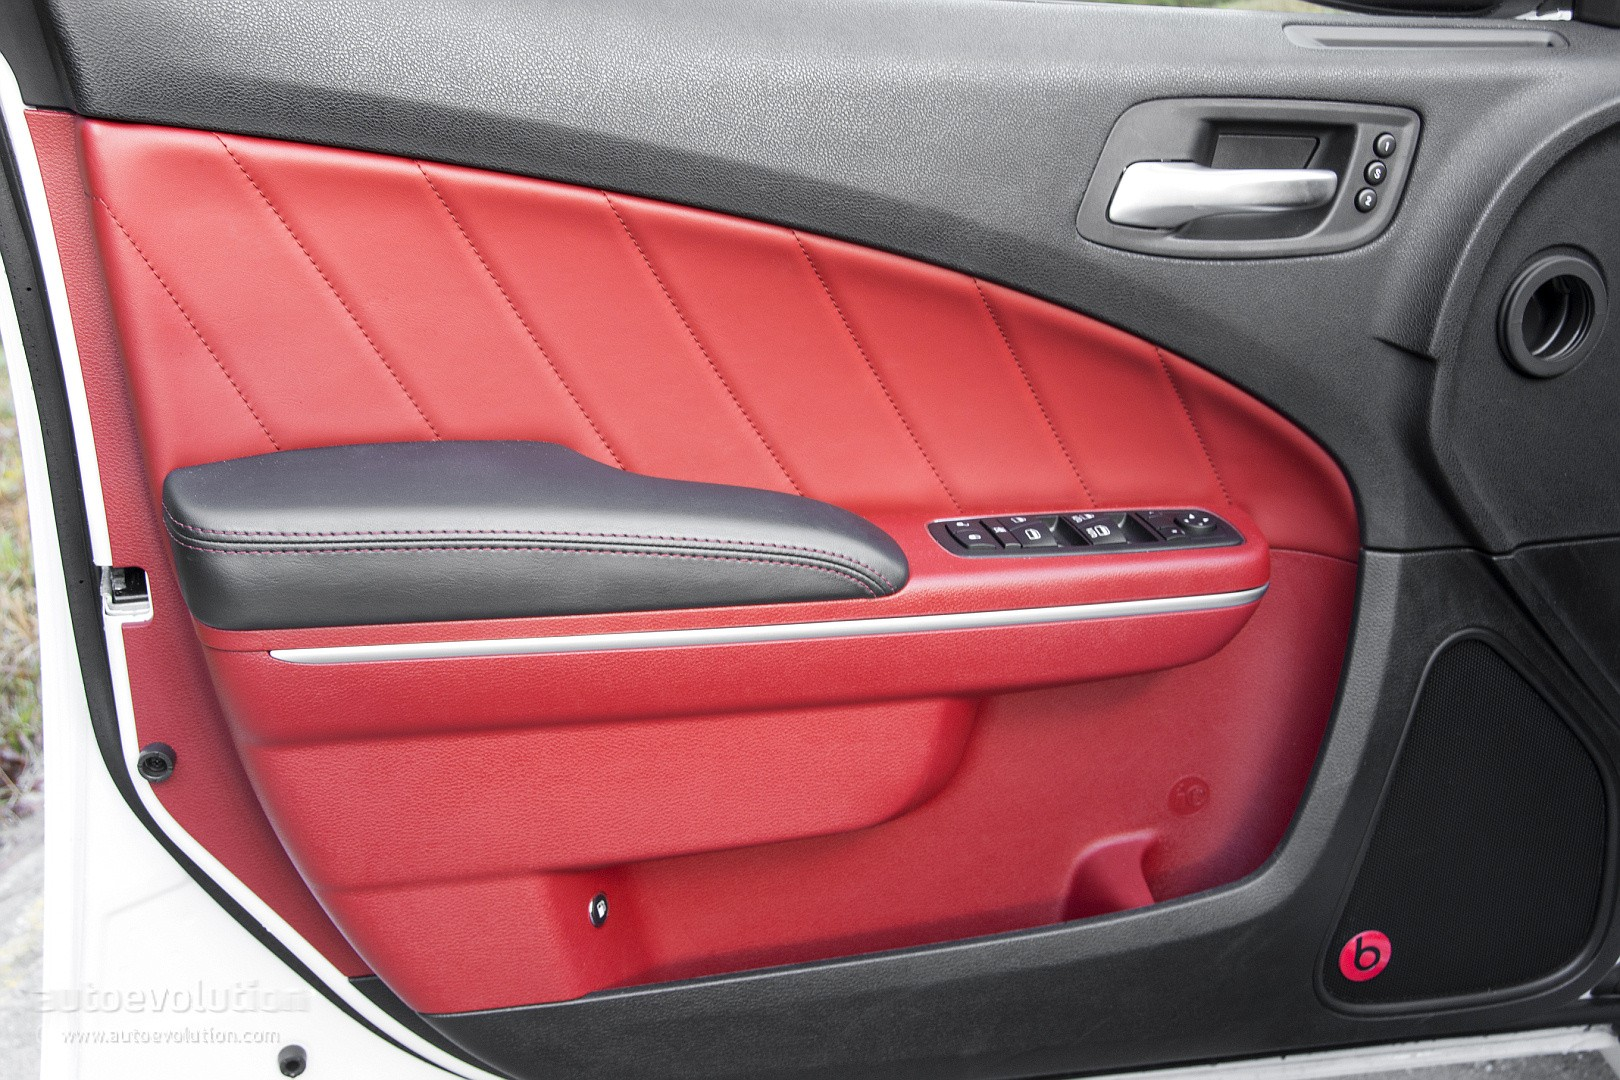 & 2015 Dodge Charger R/T Review - autoevolution